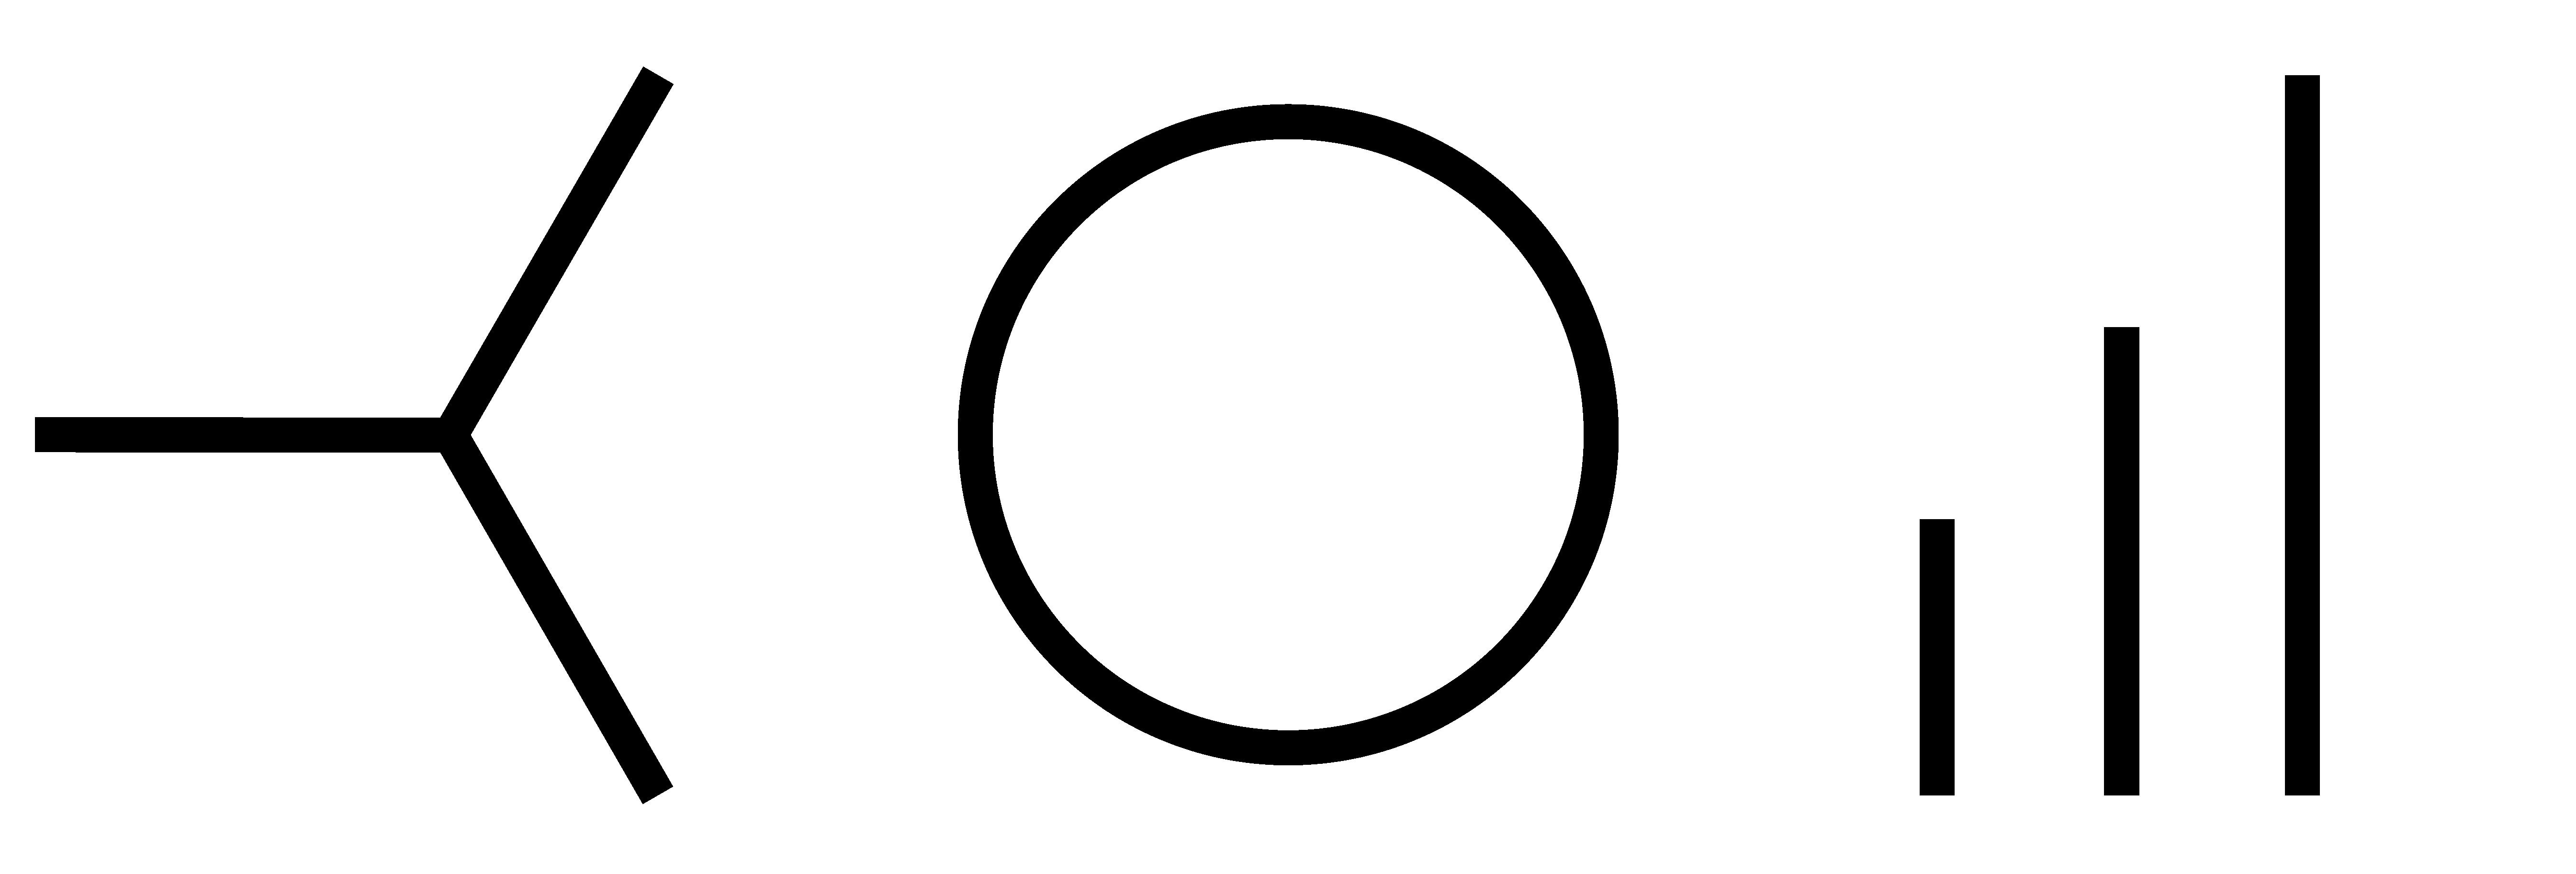 neon-symbol